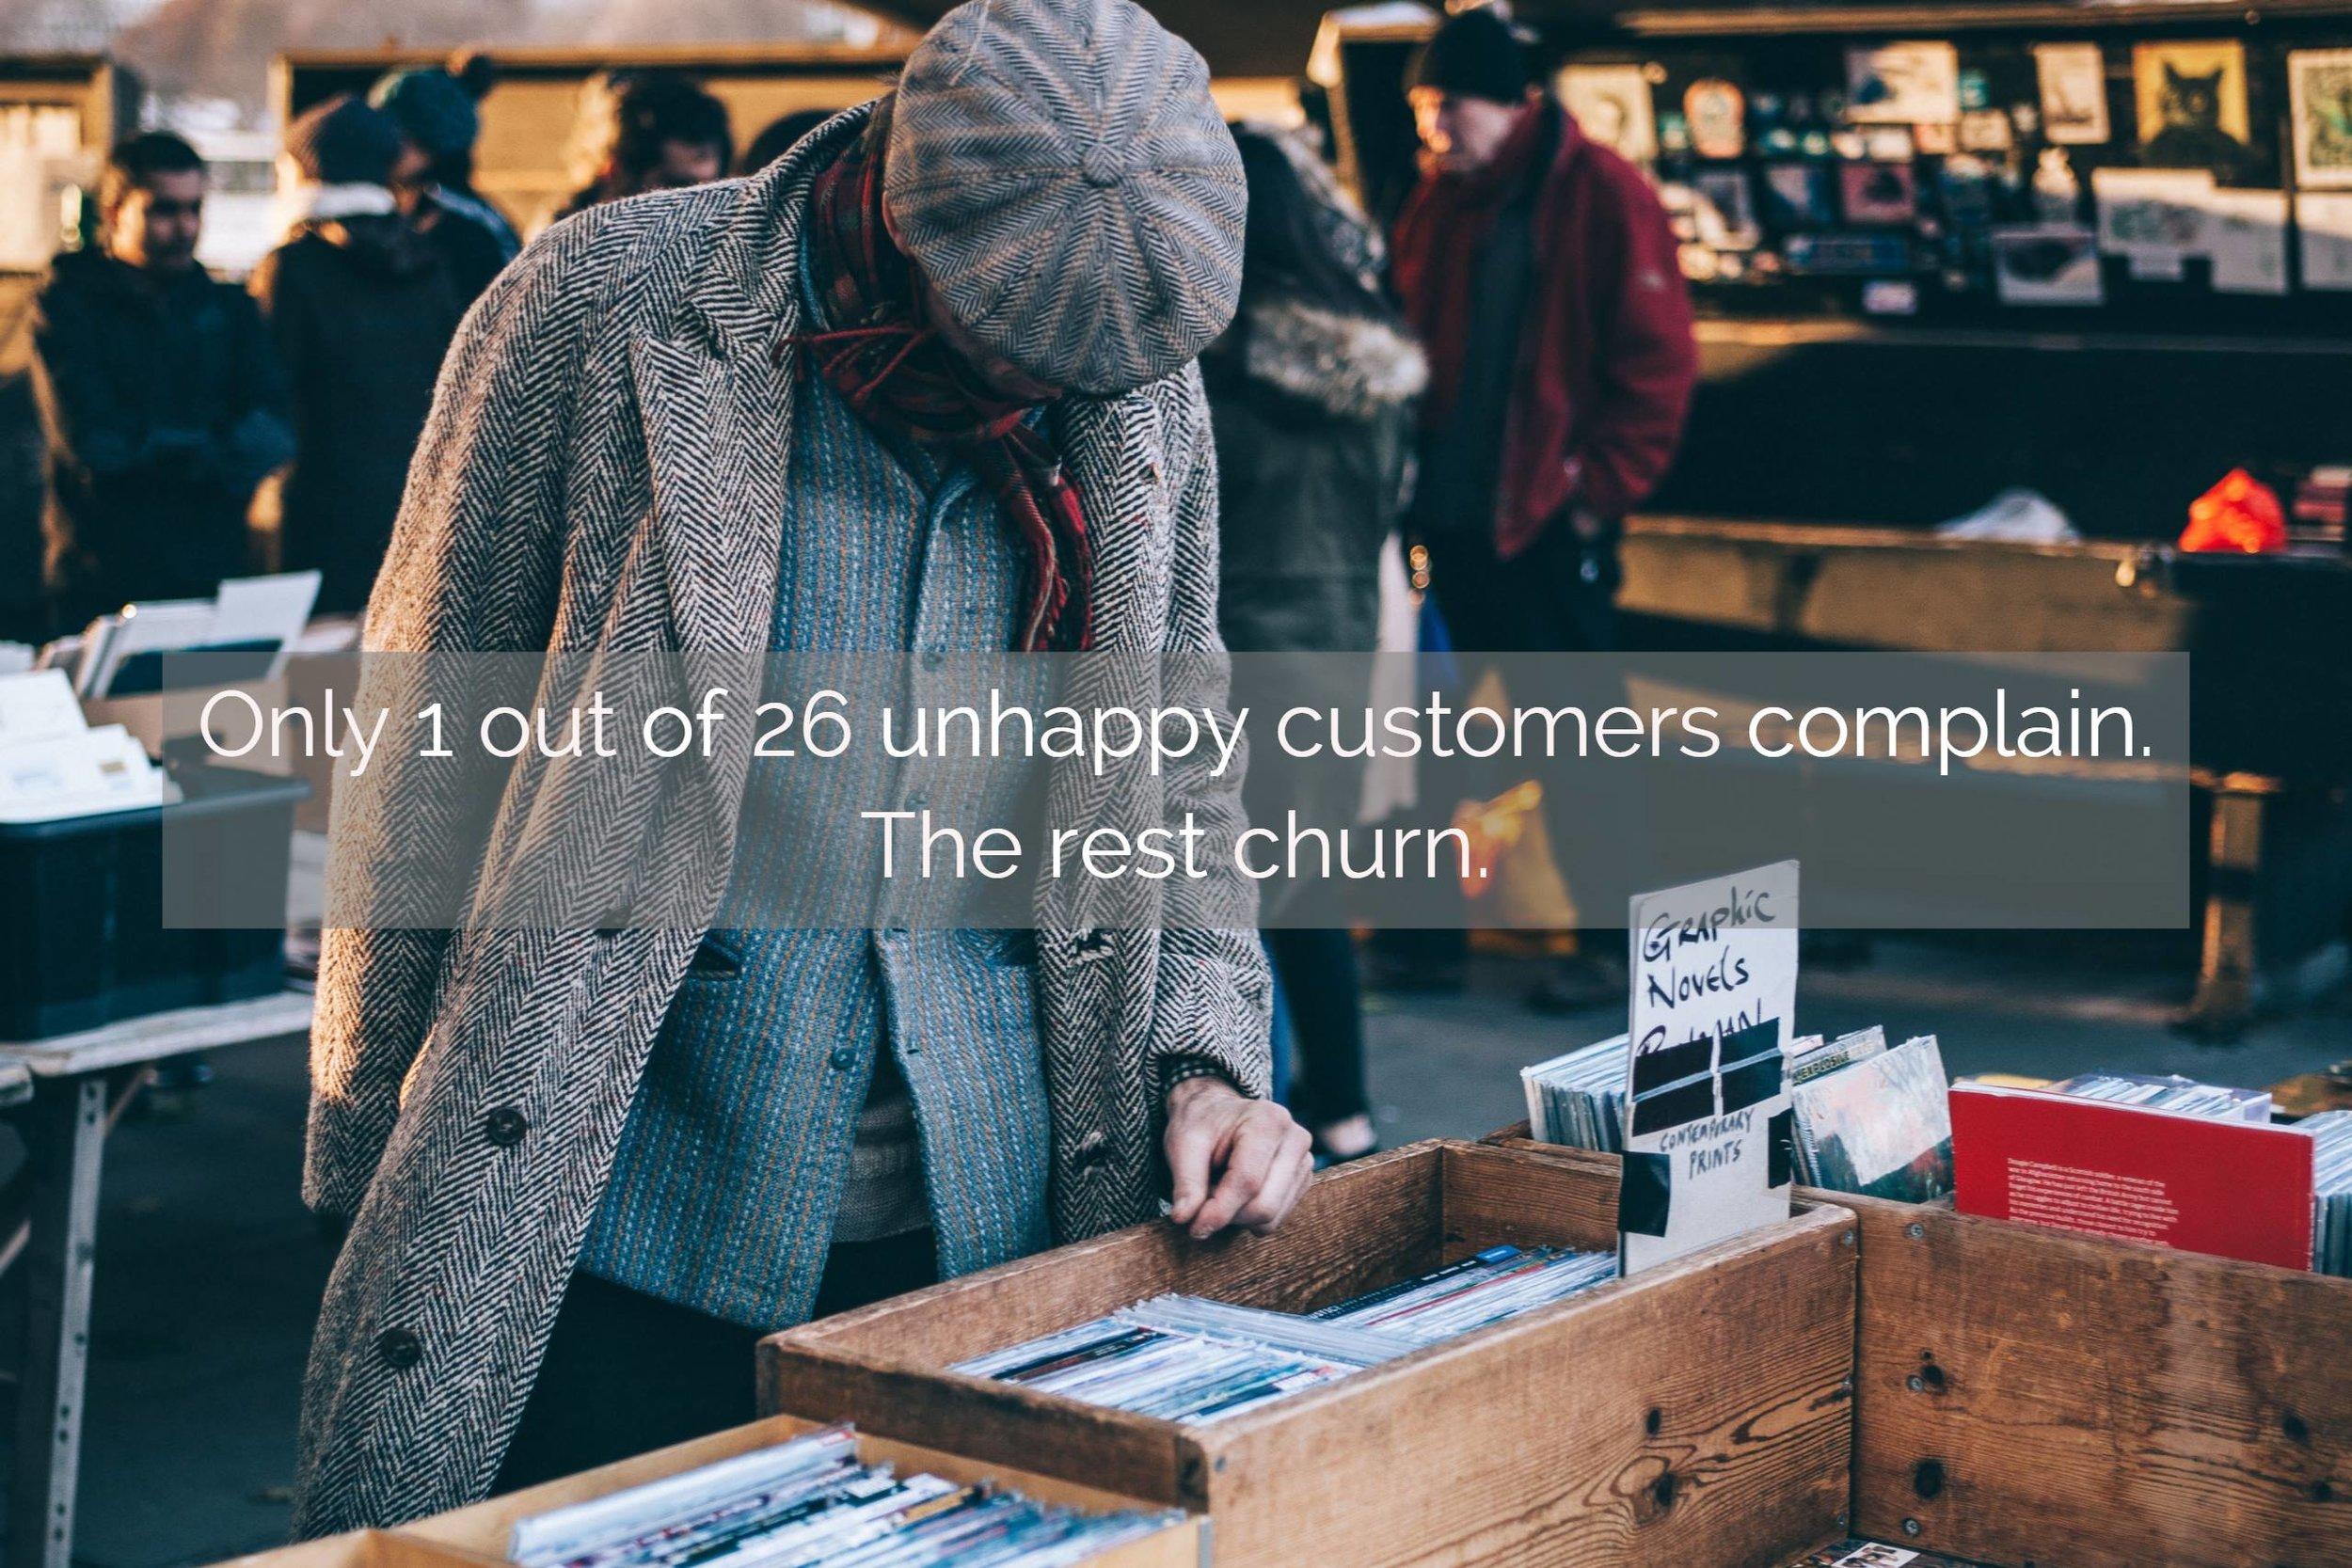 ice_customer_satisfaction.PNG